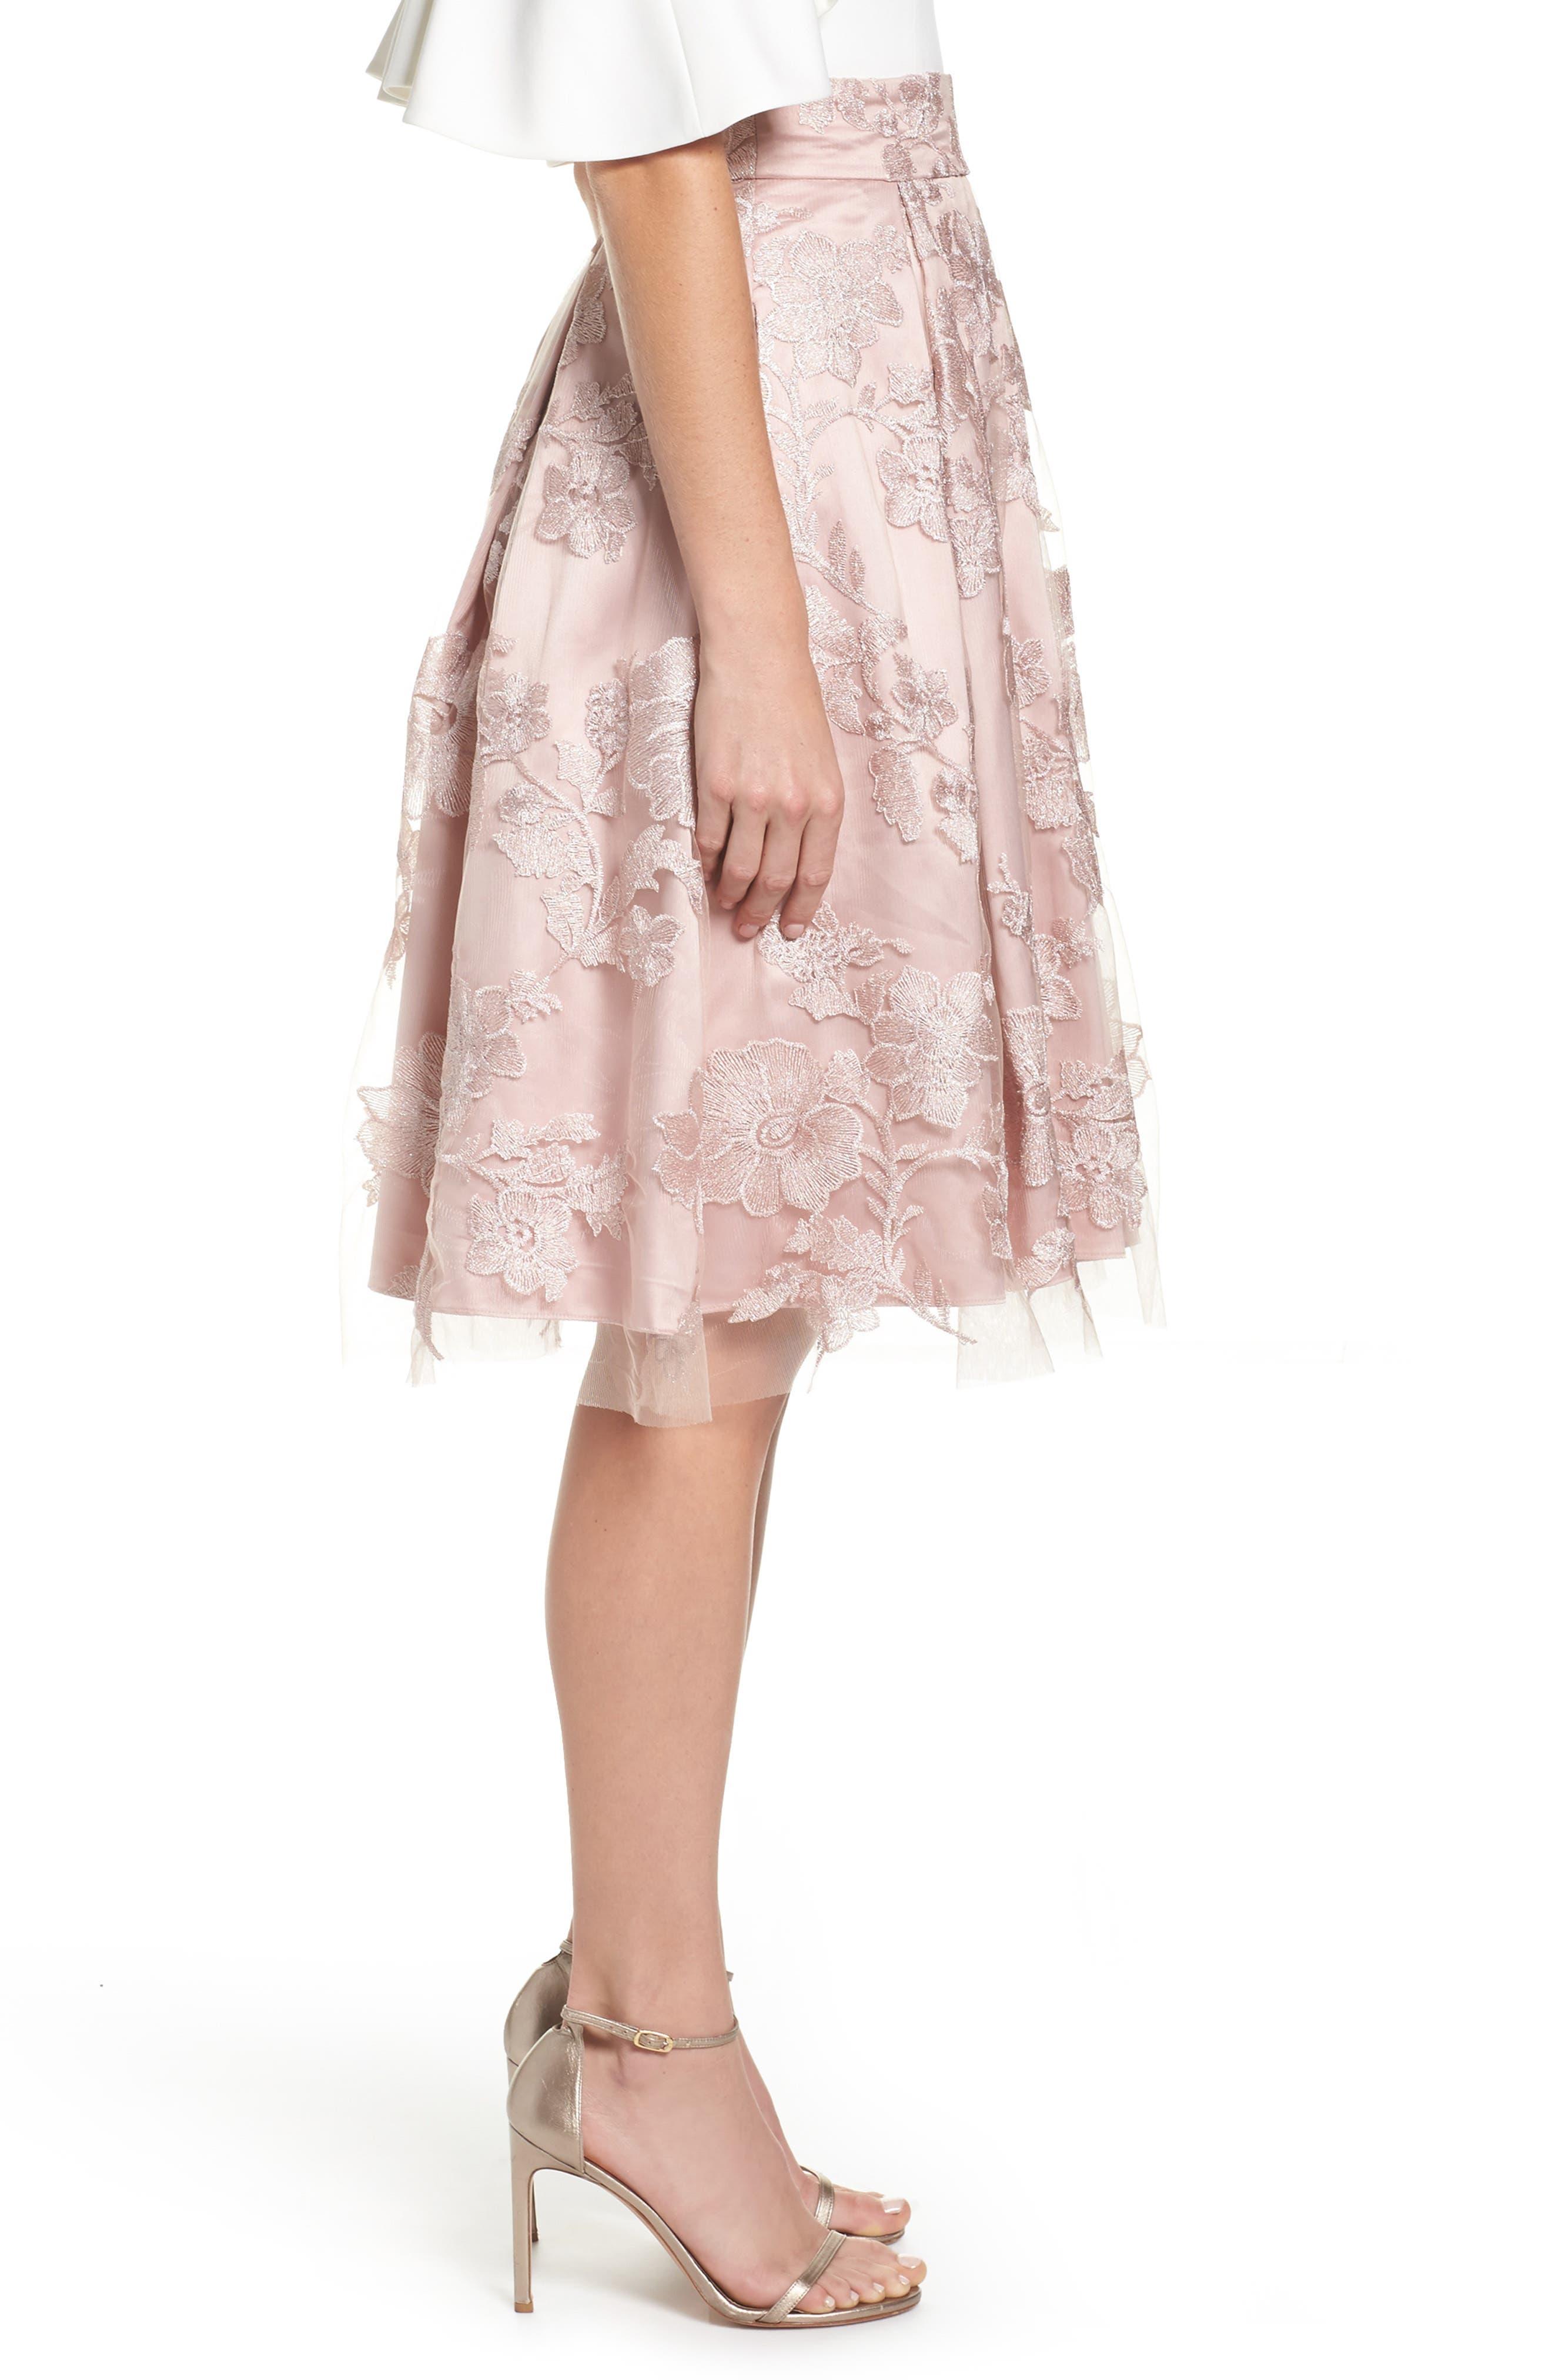 ELIZA J, Floral Embroidered Skirt, Alternate thumbnail 3, color, 254